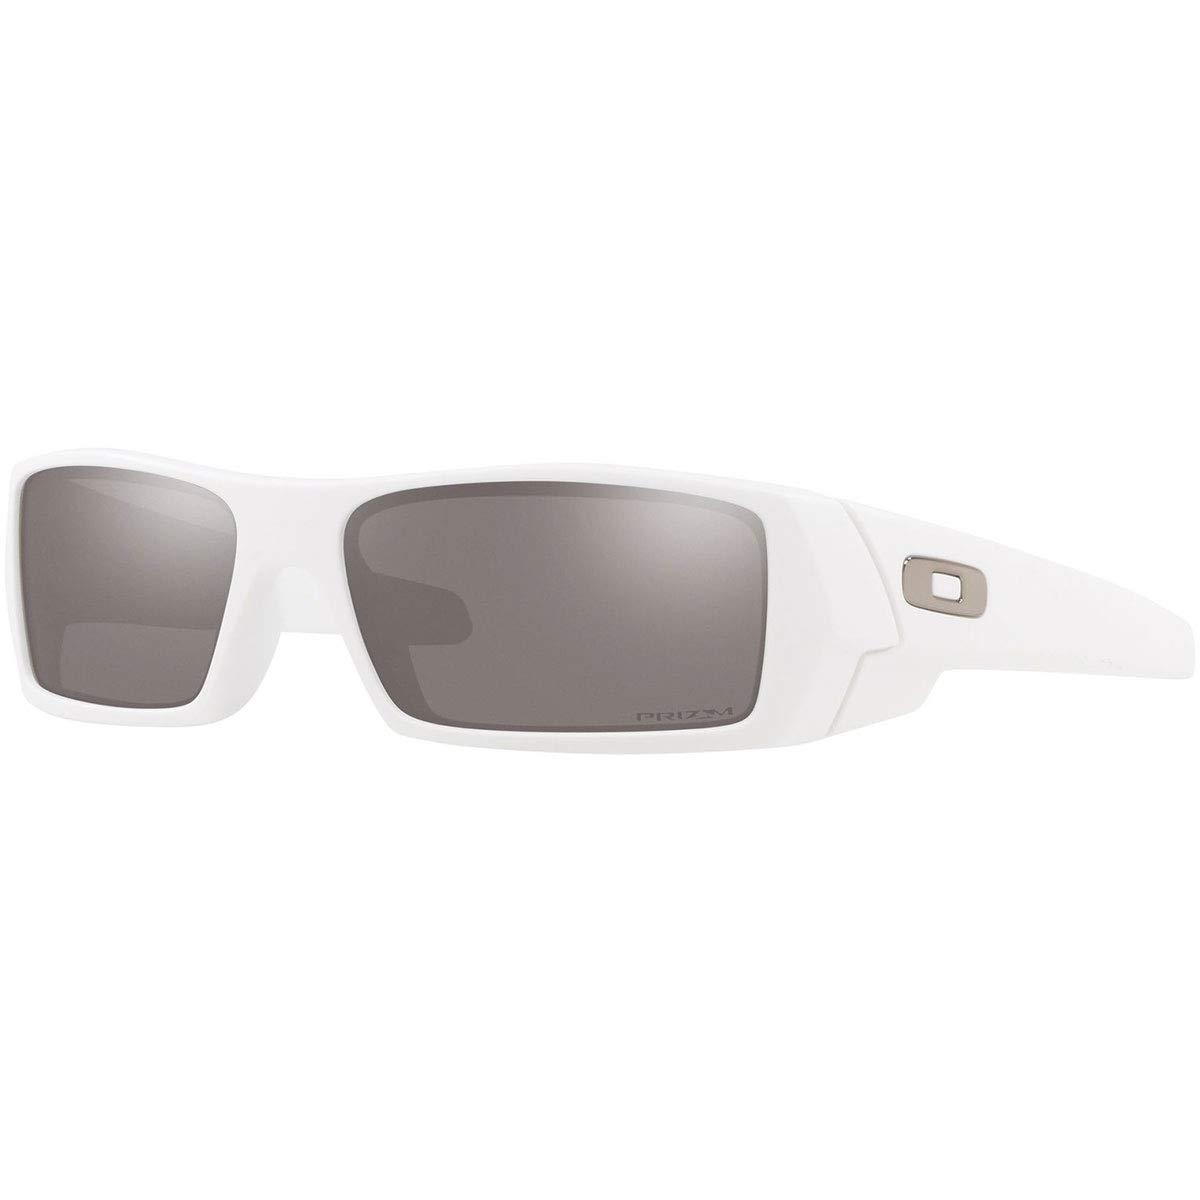 c6be567c1a Amazon.com: Oakley Men's Gascan Polarized Rectangular Sunglasses, Matte  Black, 60 mm: Clothing